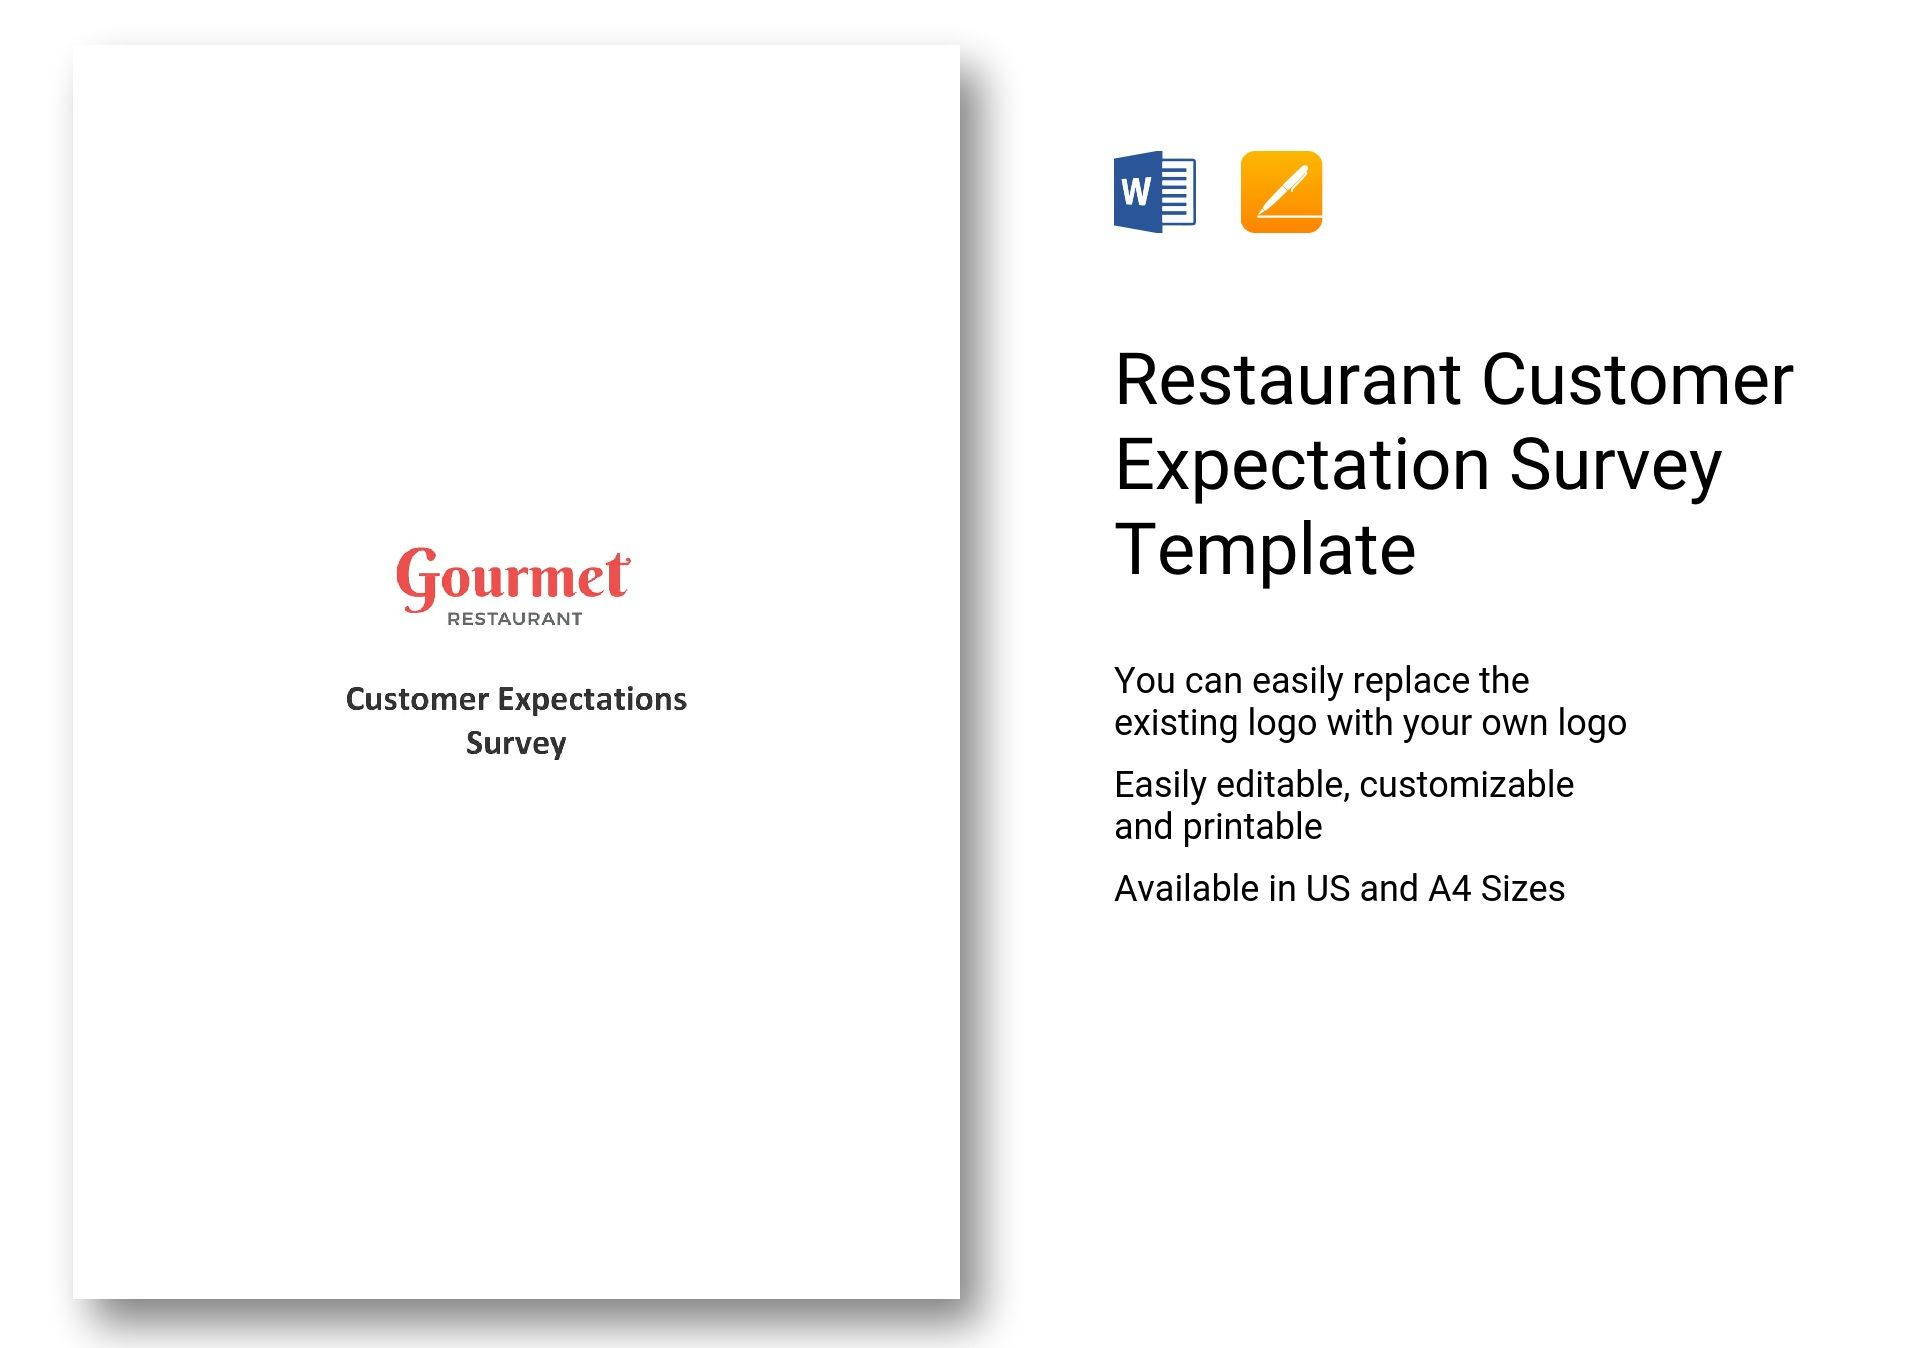 Restaurant Customer Expectation Survey